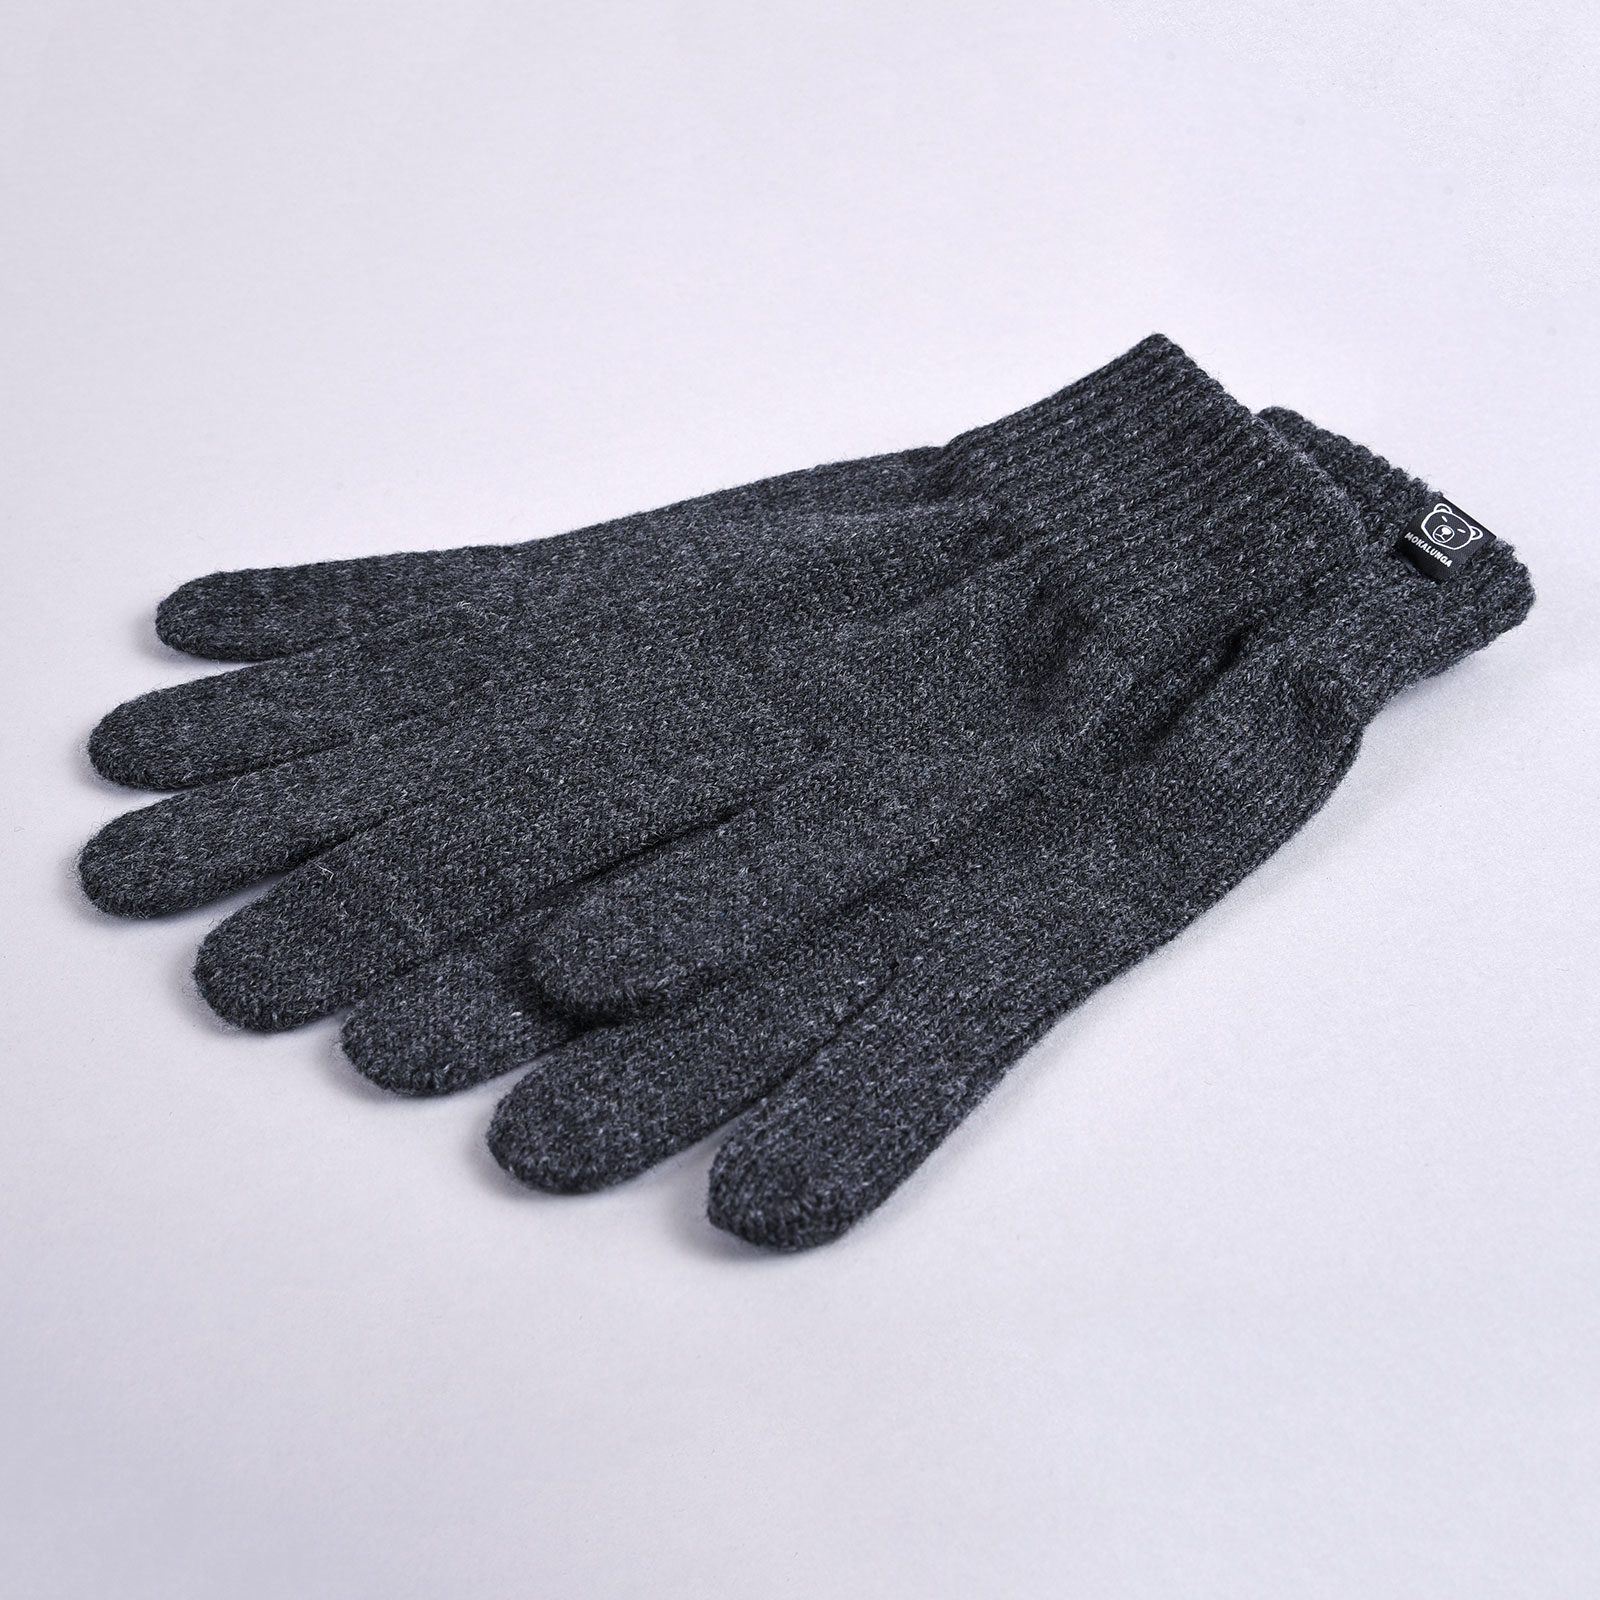 http://lookbook.allee-du-foulard.fr/wp-content/uploads/2018/11/GA-00021-F16-2-paire-de-gants-homme-gris-1-1600x1600.jpg